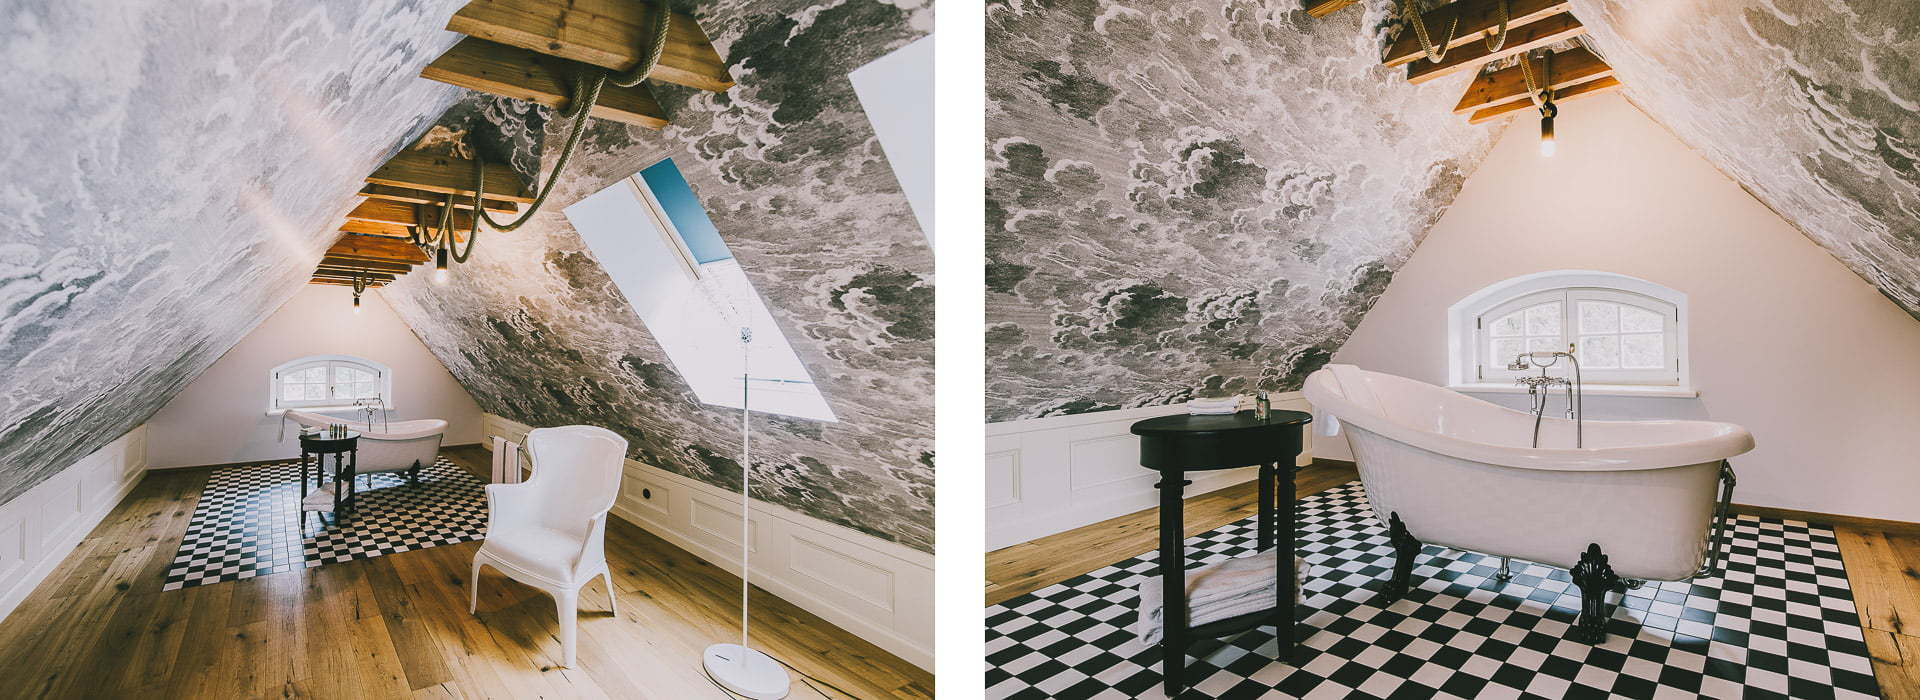 HOTEL QUADRILLE - Apartament – GDYNIA ORŁOWO